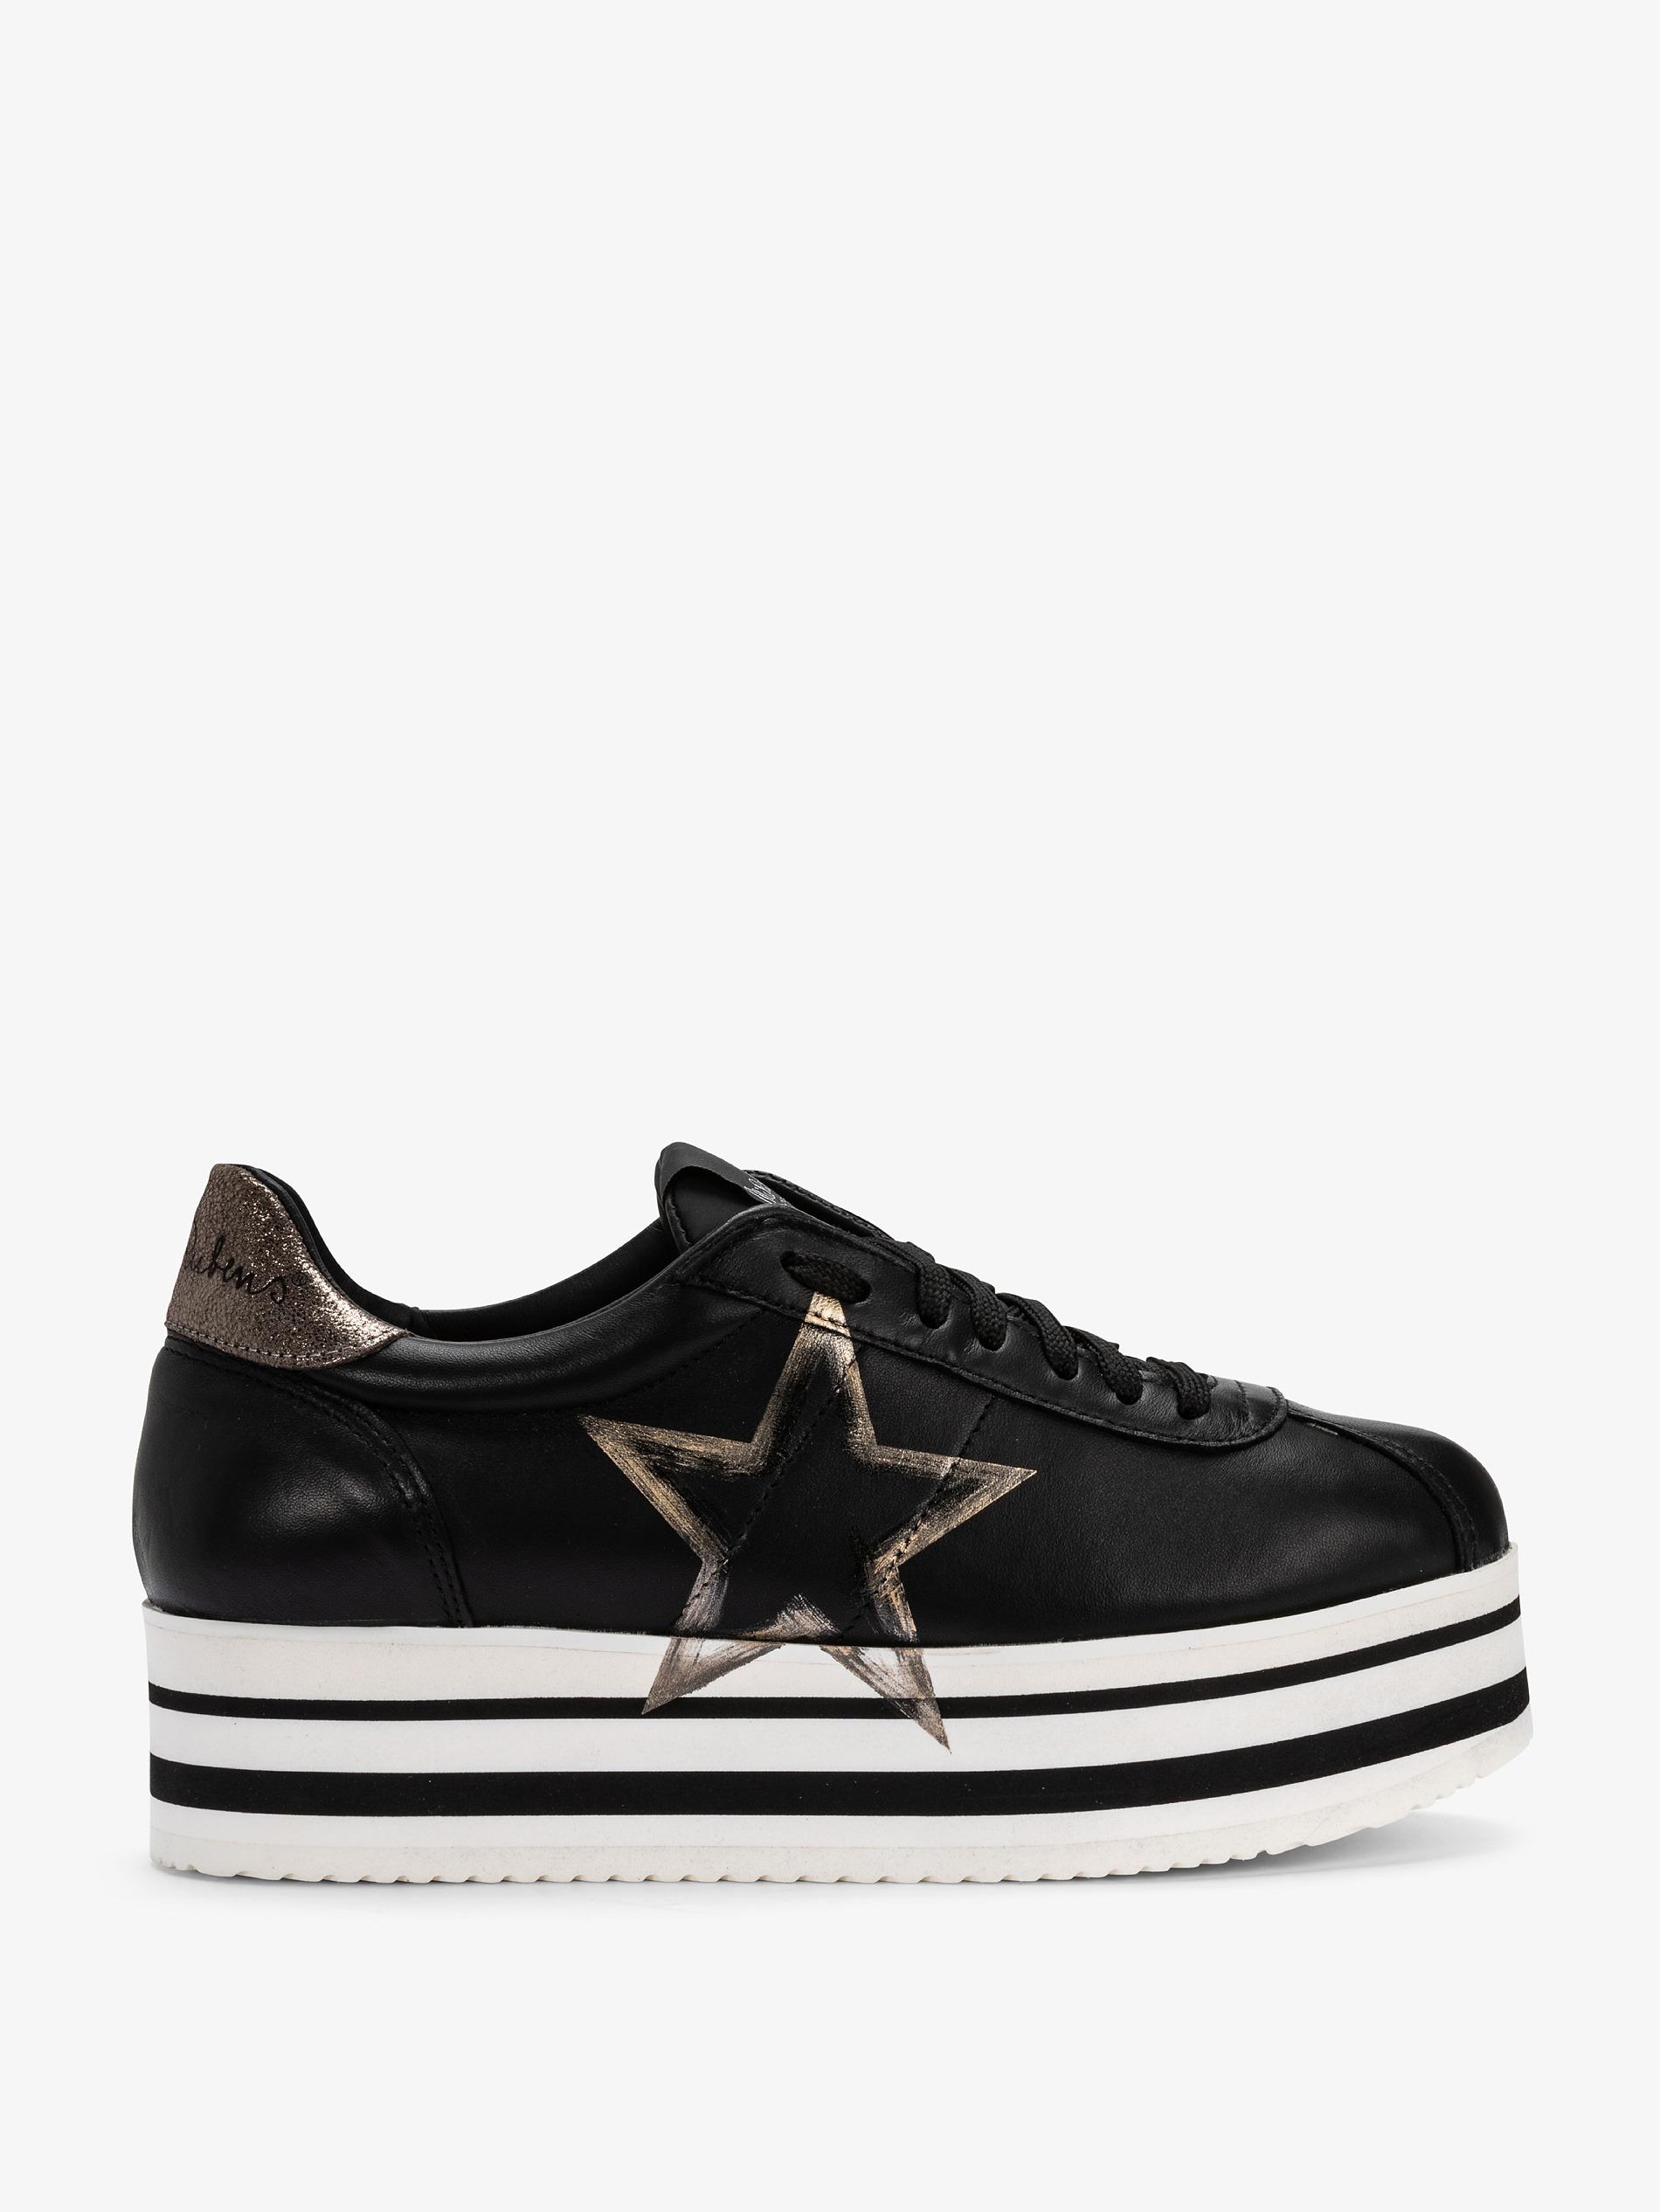 Platform Laterale Nere Con Sneakers Stella X7pq0wX8x